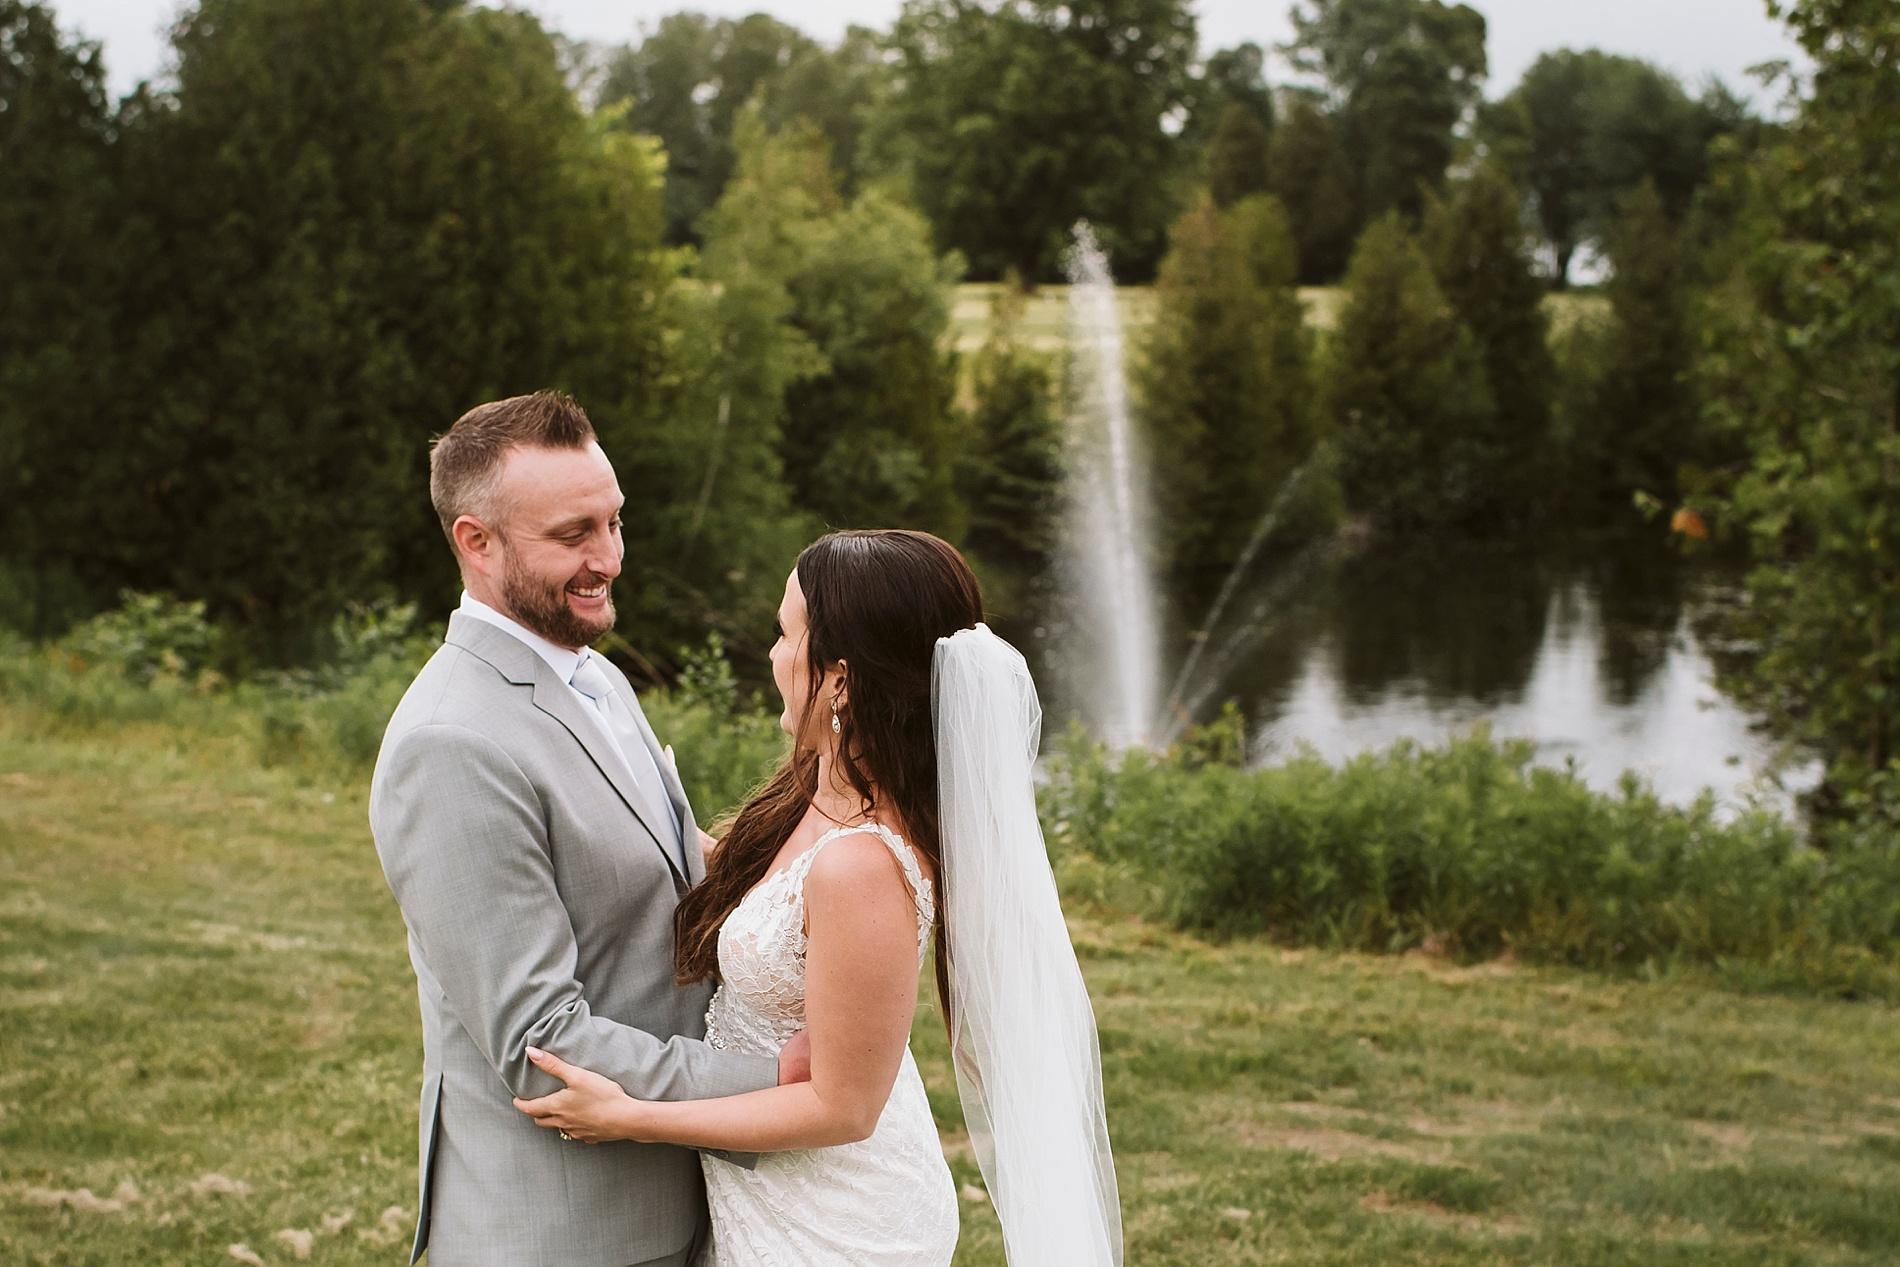 Kawartha_Lakes_Wedding_Bobcageon_Eganridge_Resort_Toronto_Photographer_0050.jpg